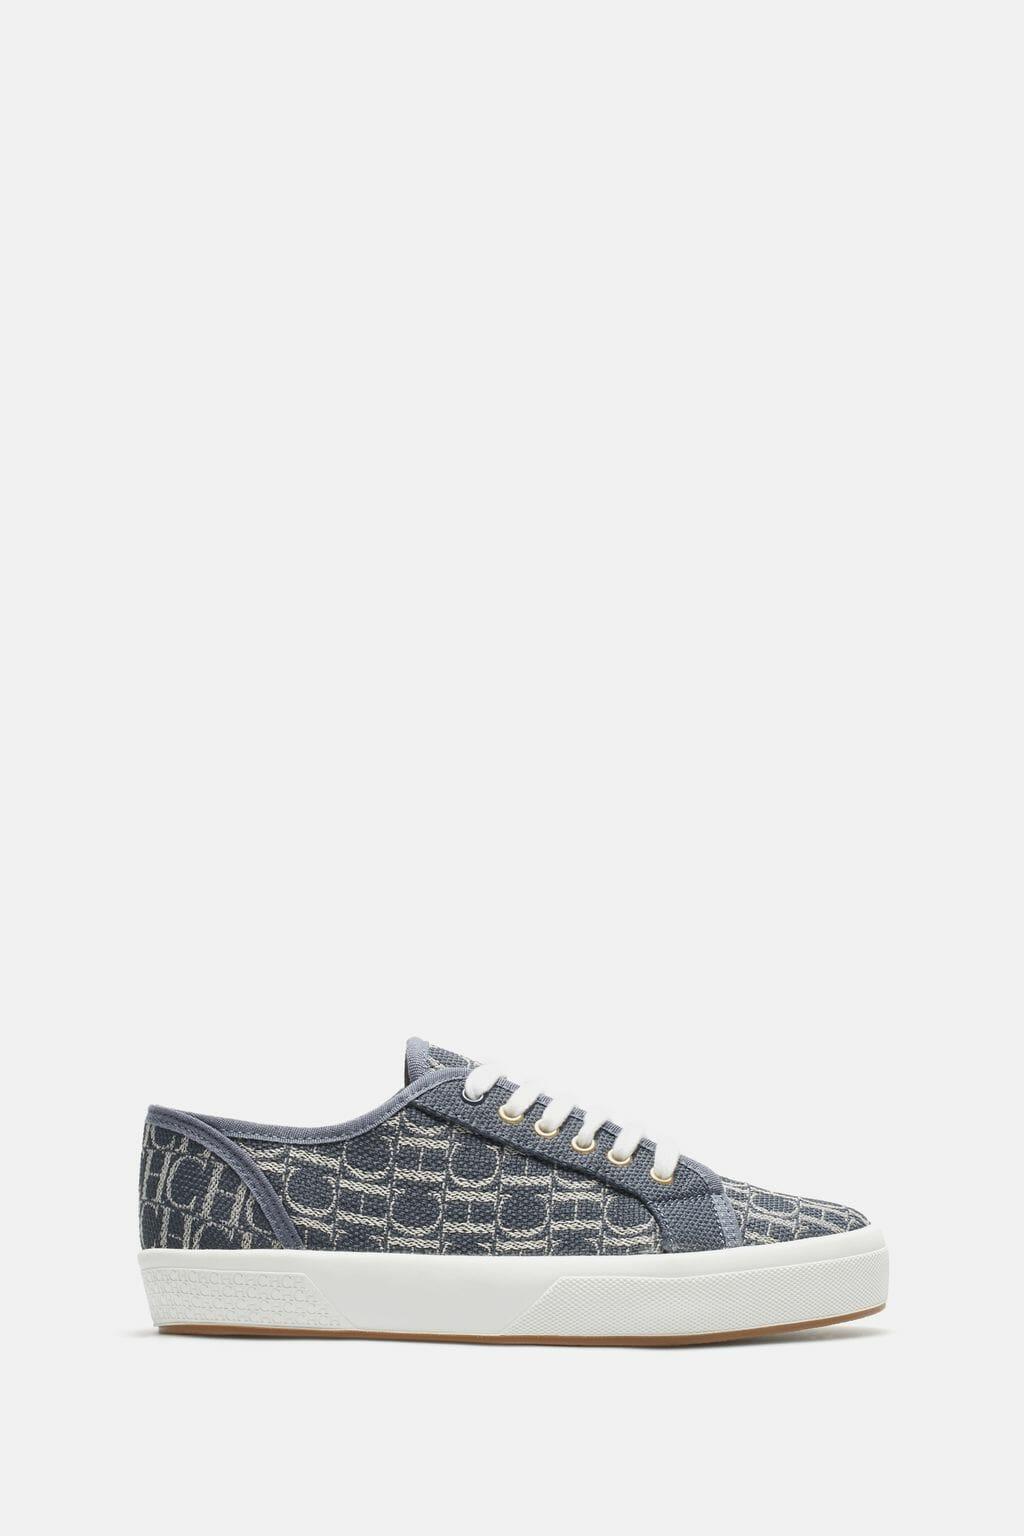 CH-Carolina-herrera-shoes-collection-Spring-Summer-2018-shoe-59